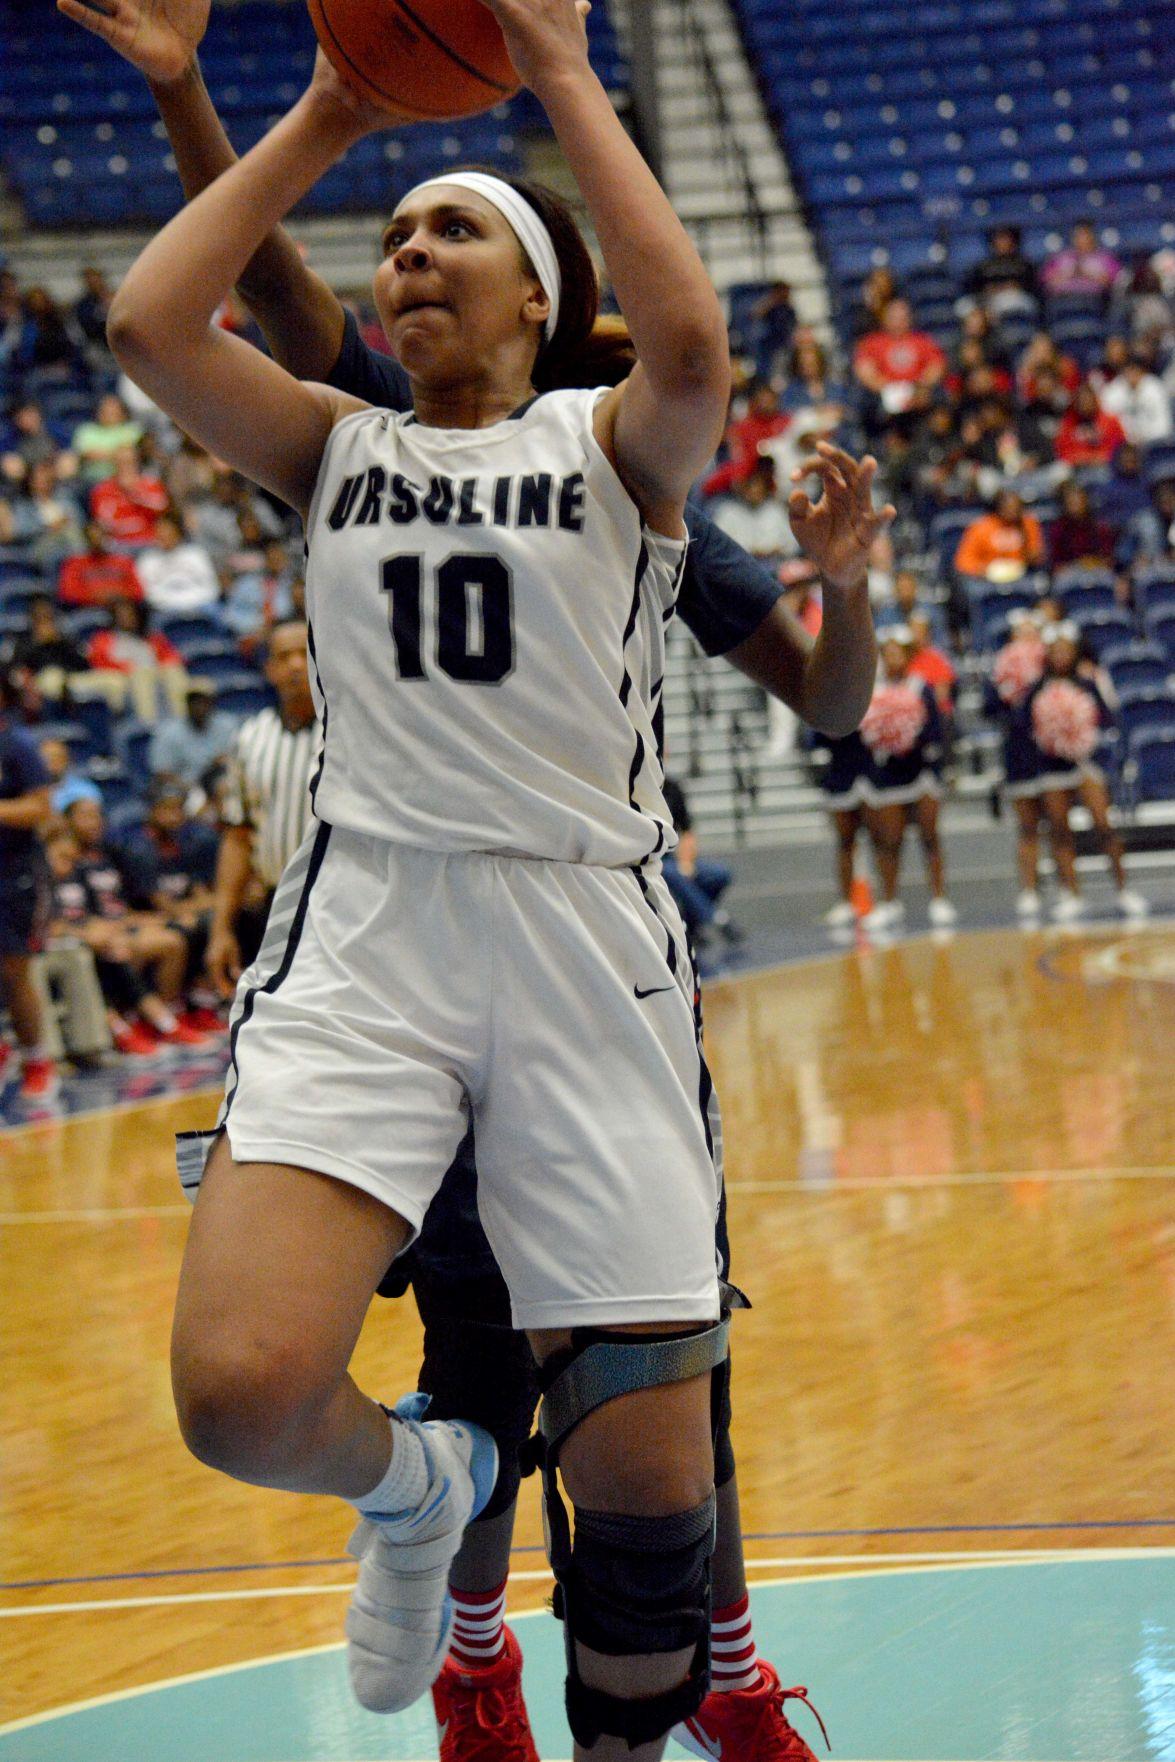 LHSAA State Girl's Basketball Championship Kourtney Weber